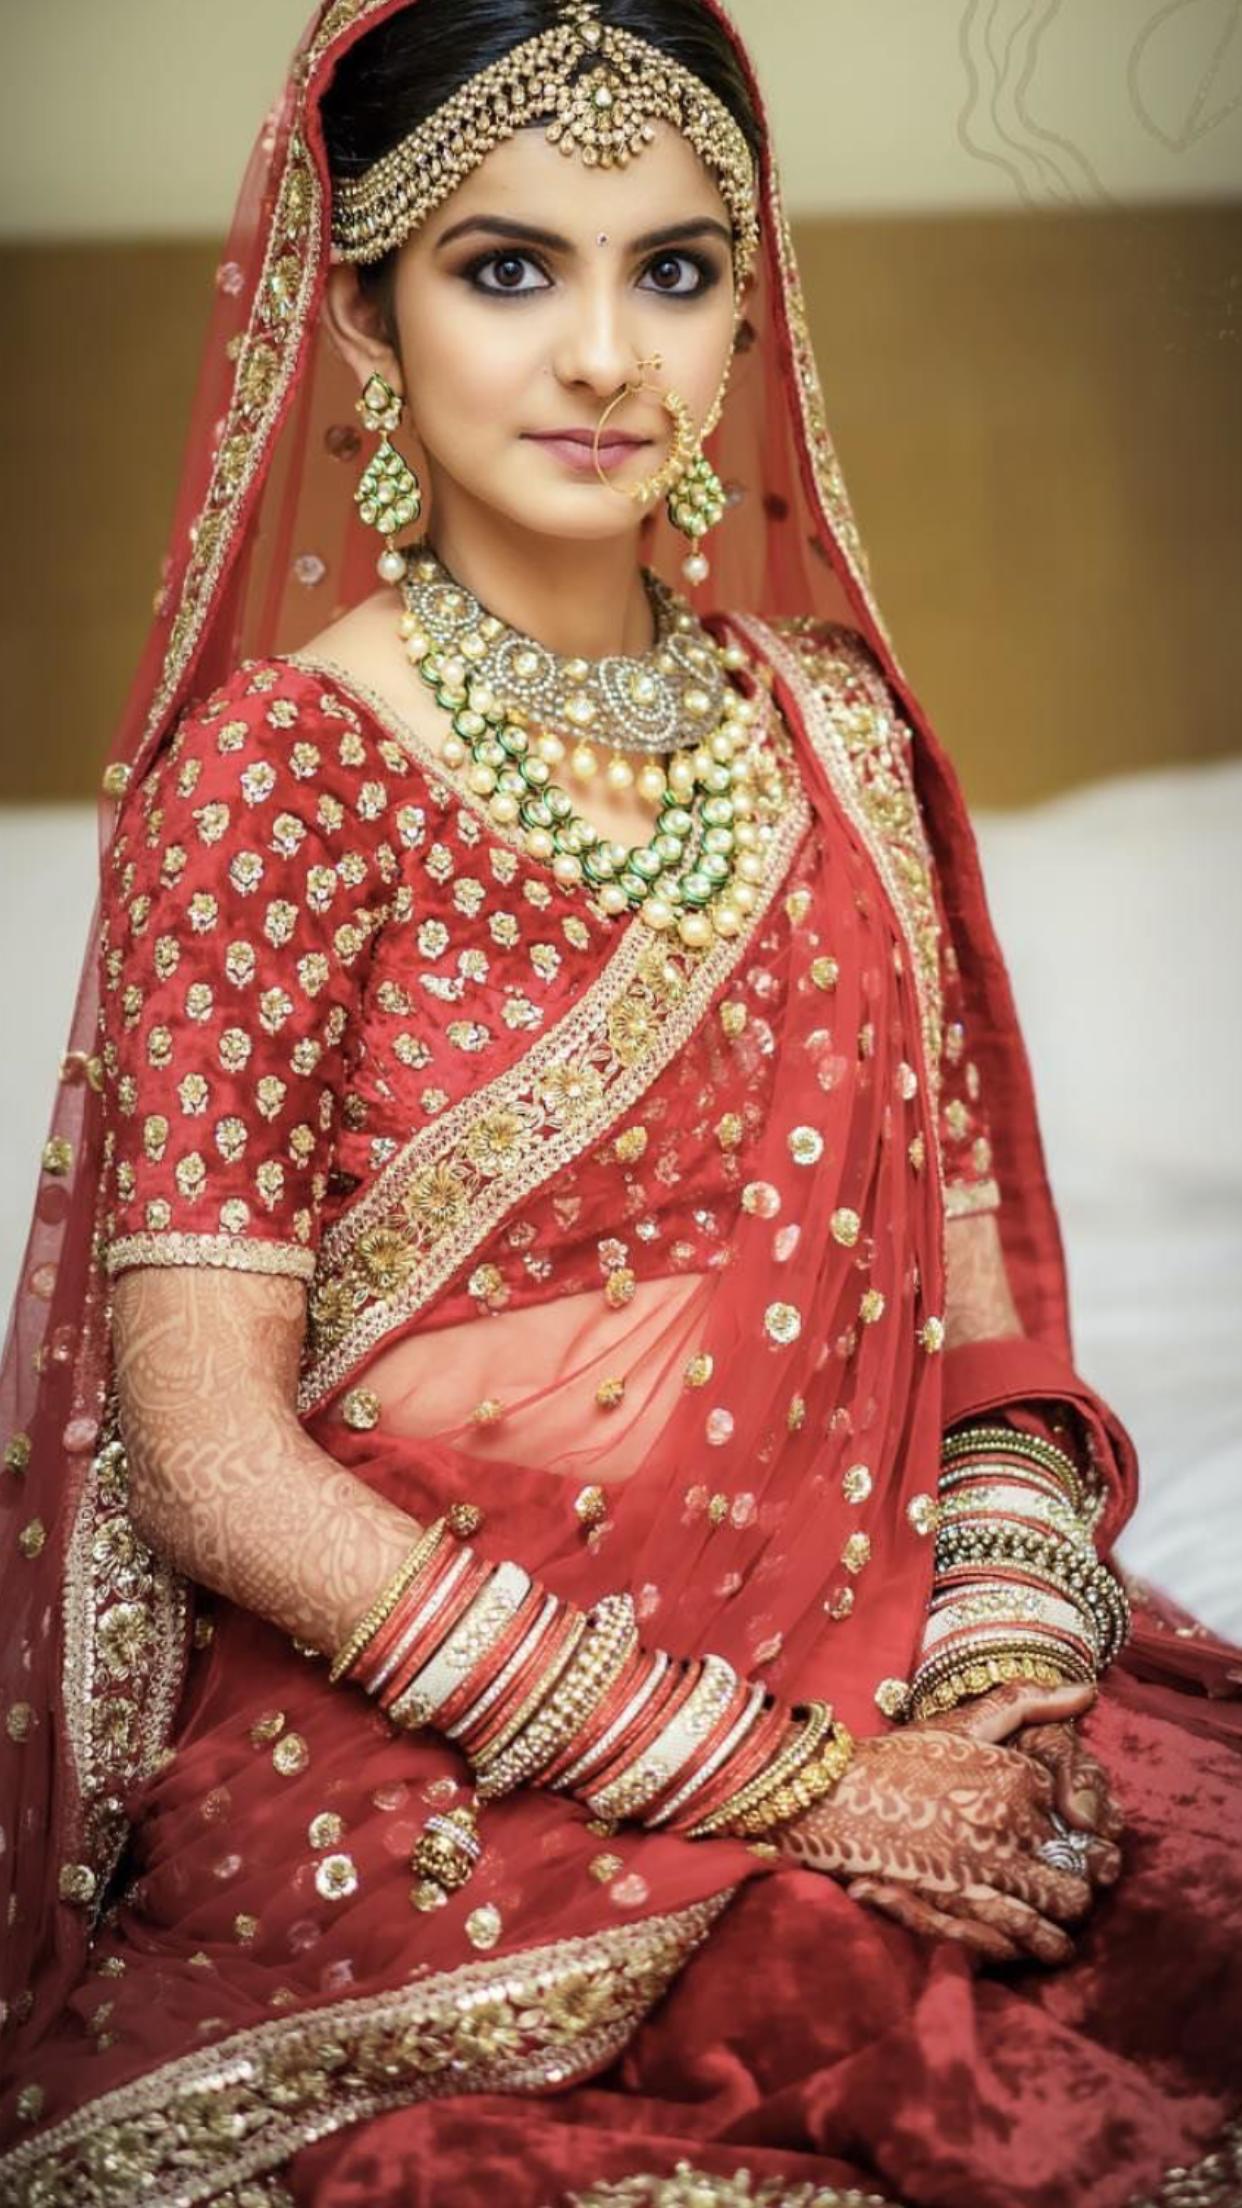 Pin de ༺AfifA༻❀༻f༺❀ en BRIDAL -RED & PINKS Desi Bride | Pinterest